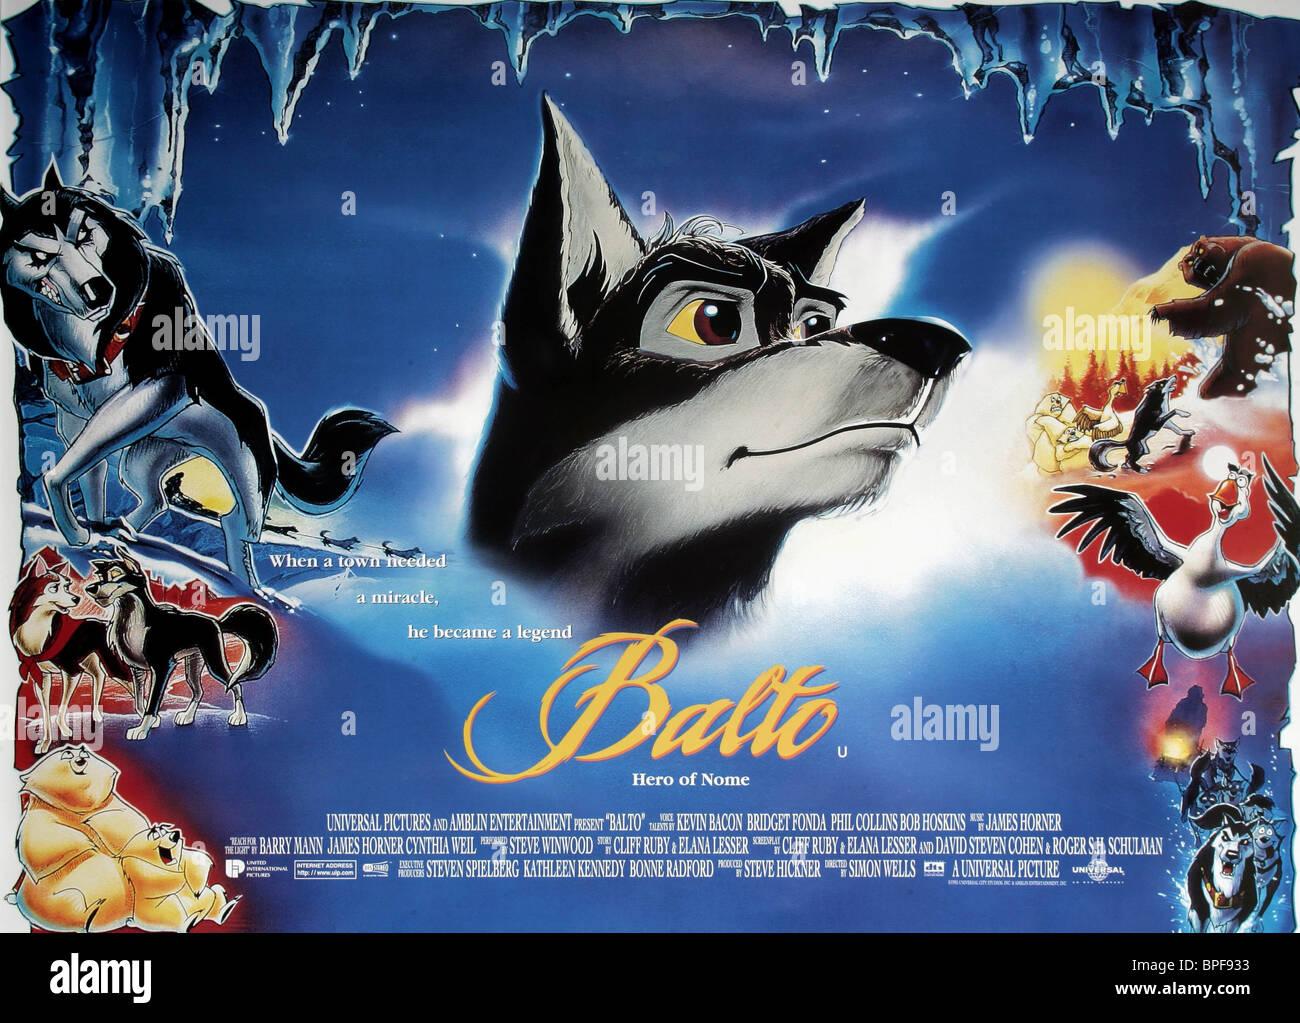 1995 Movie Posters: BALTO POSTER BALTO (1995 Stock Photo: 31069223